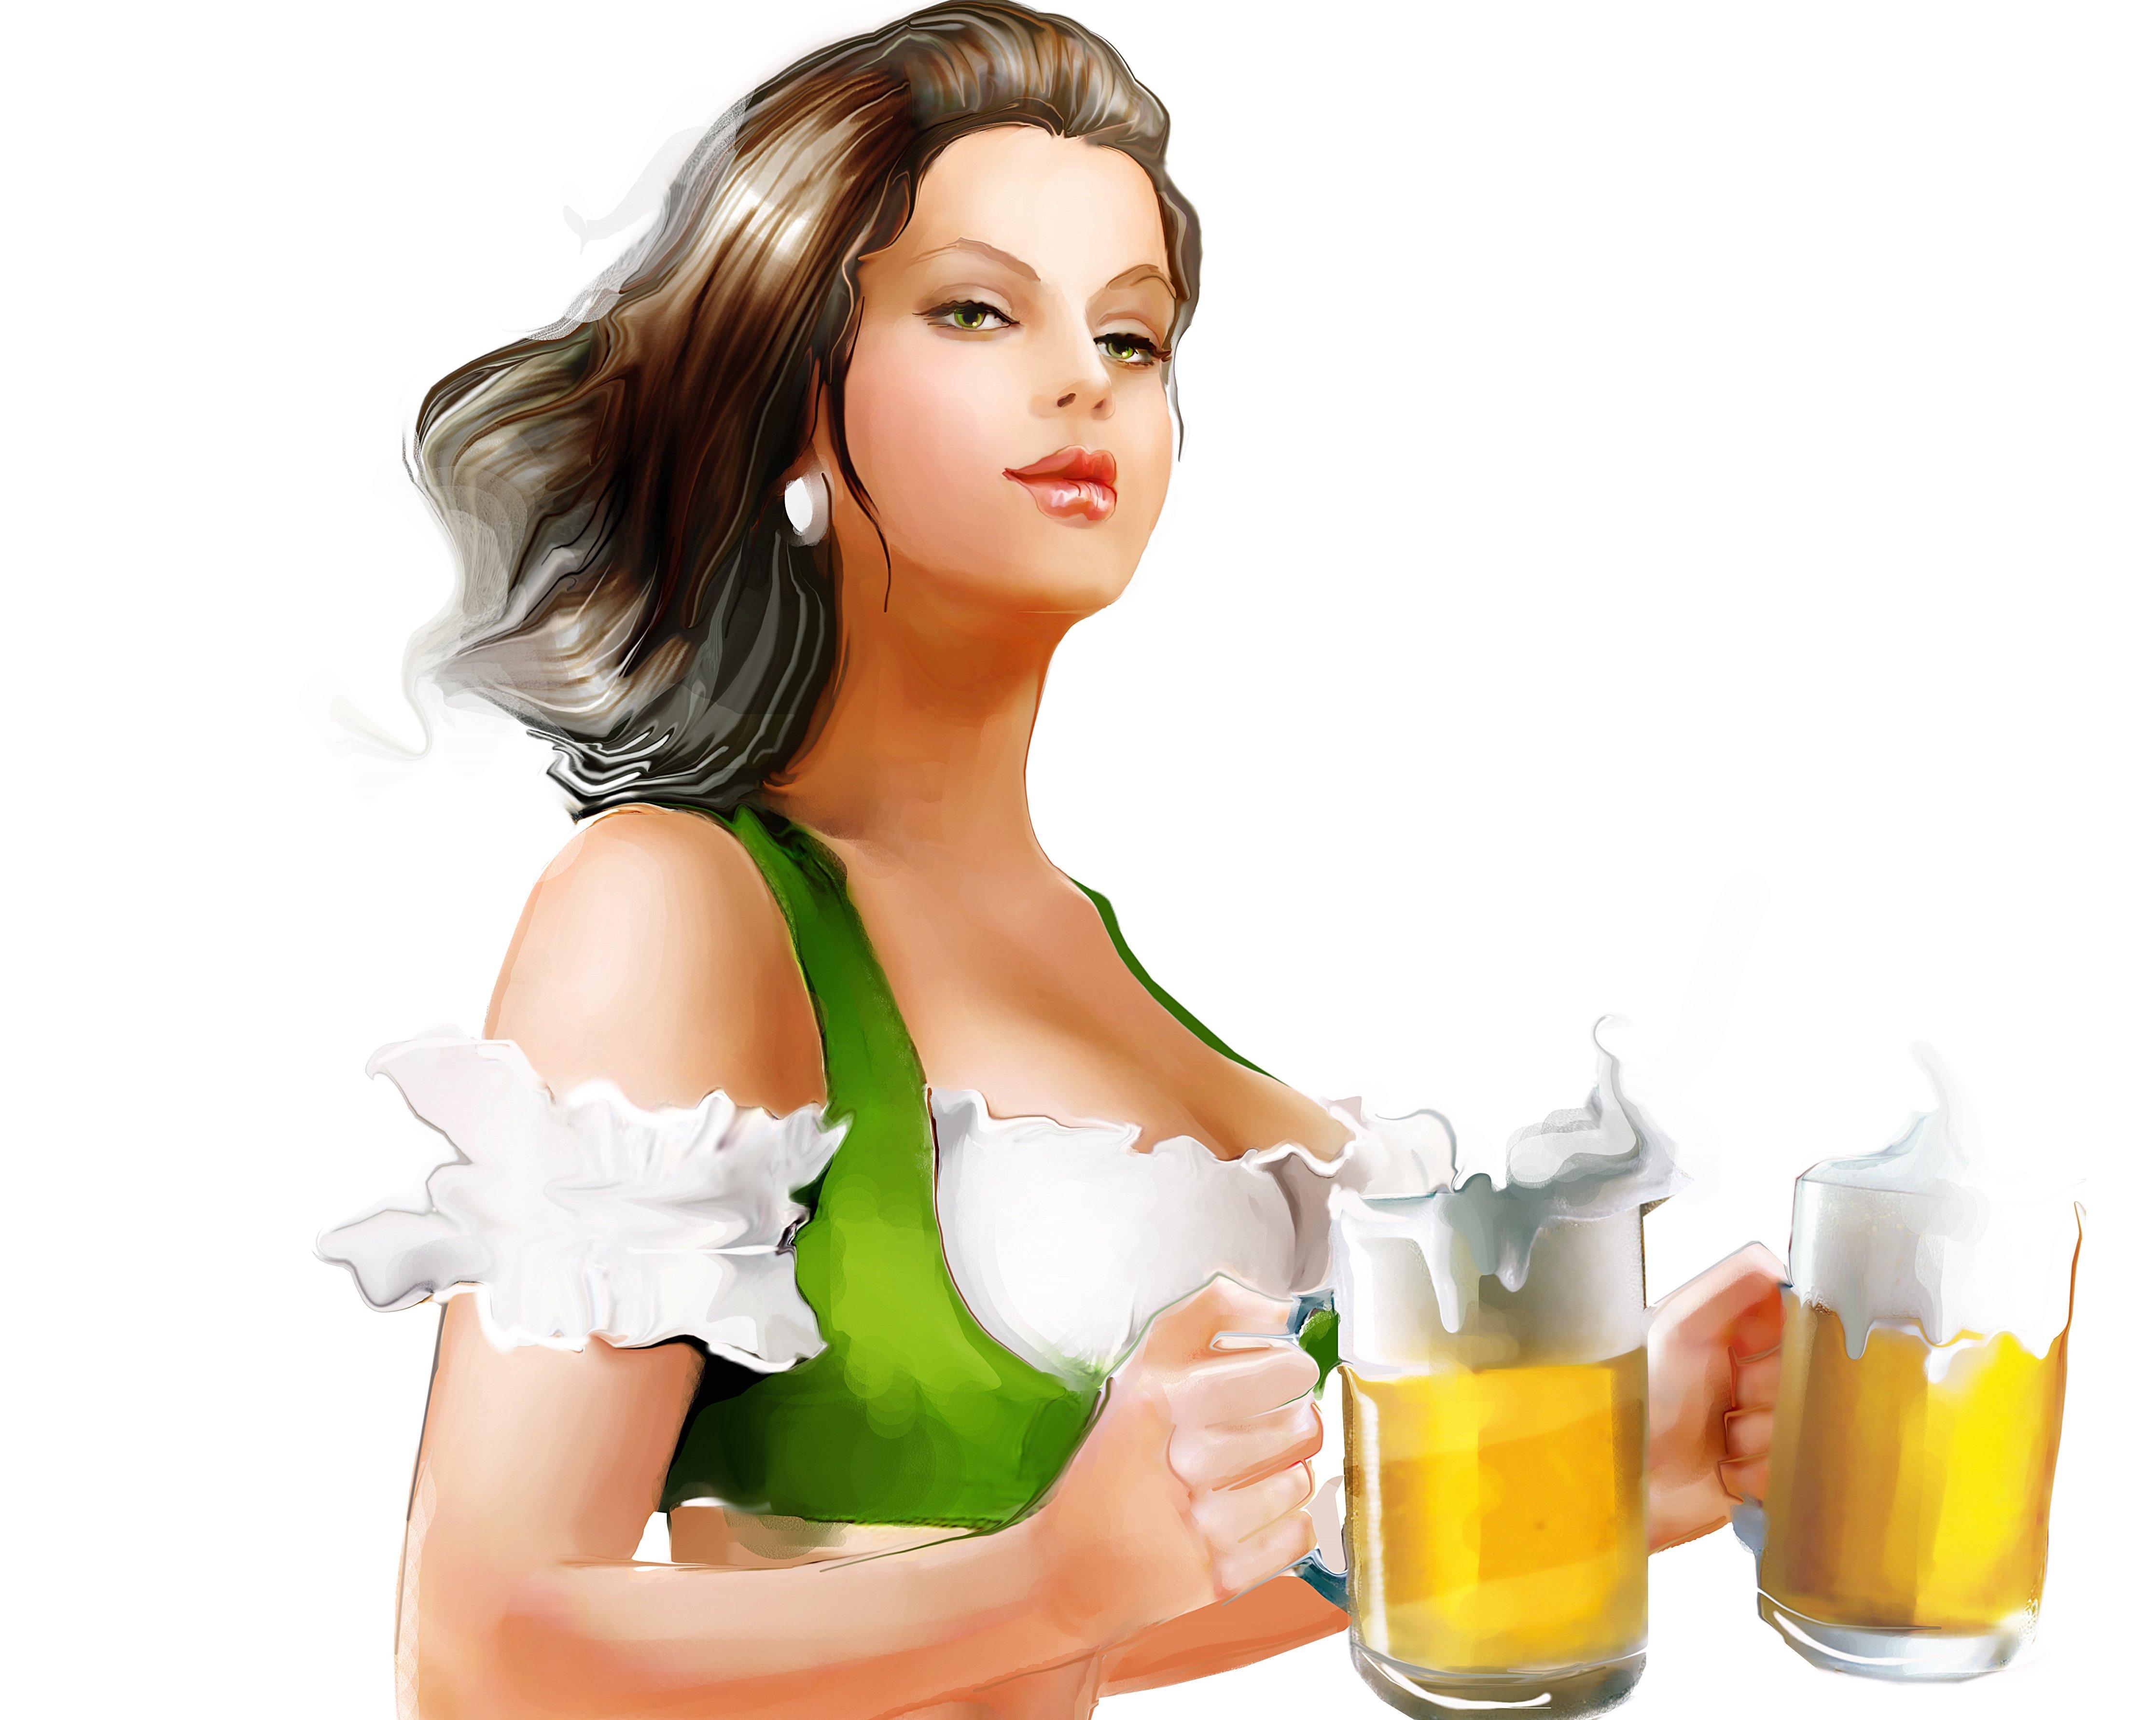 девушка лицо чаепитие girl face the tea party  № 1849769 бесплатно